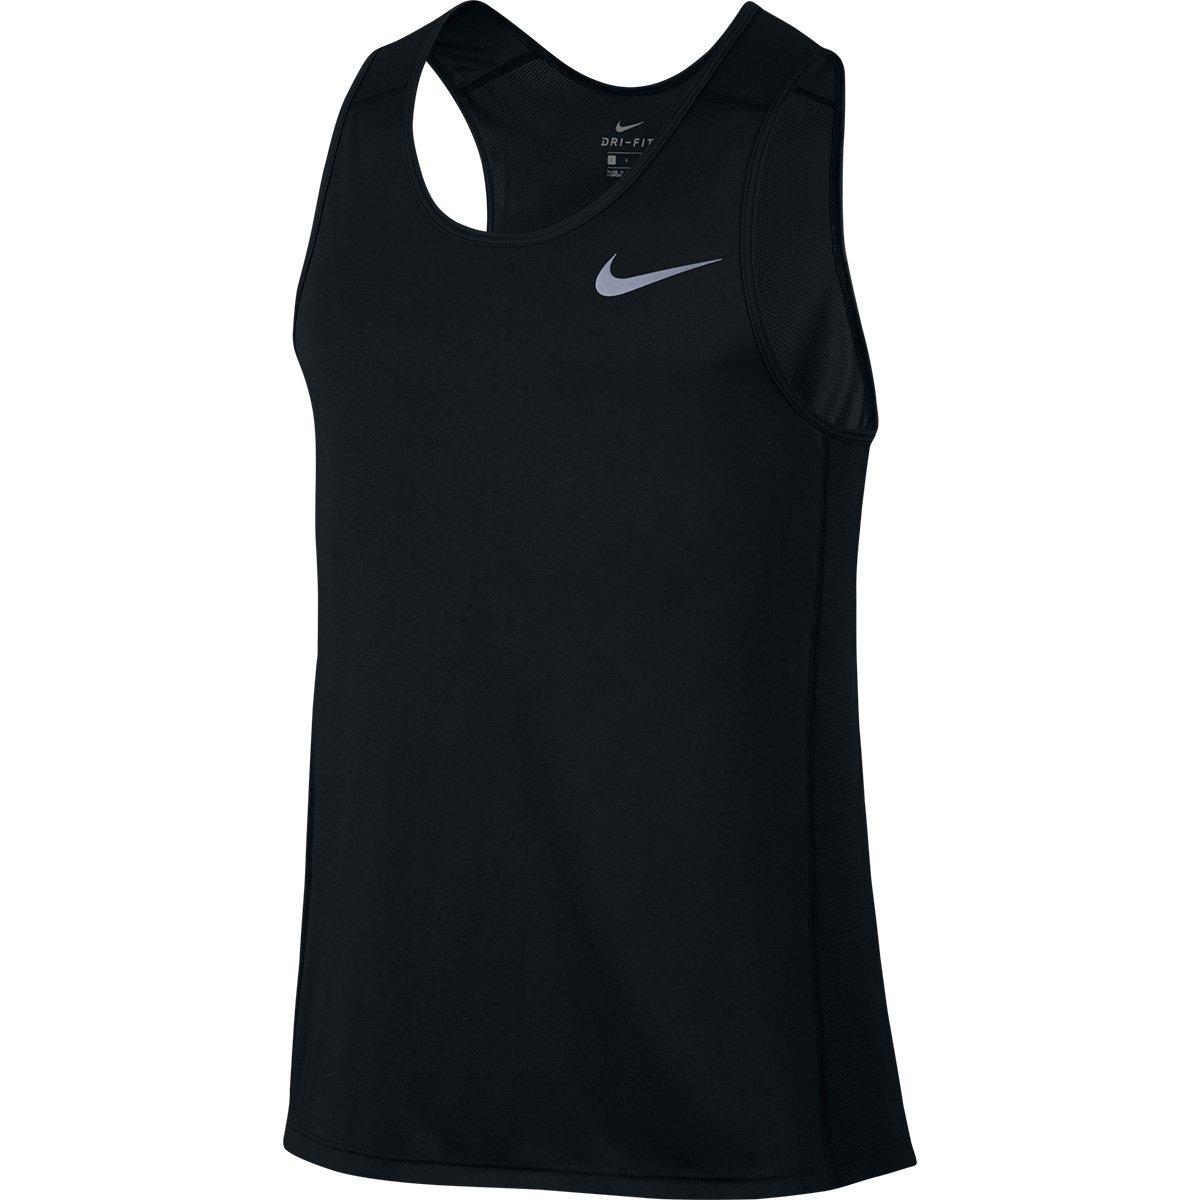 Regata Nike Dri-Fit Miler Masculina - Preto - Compre Agora  20417e91a09